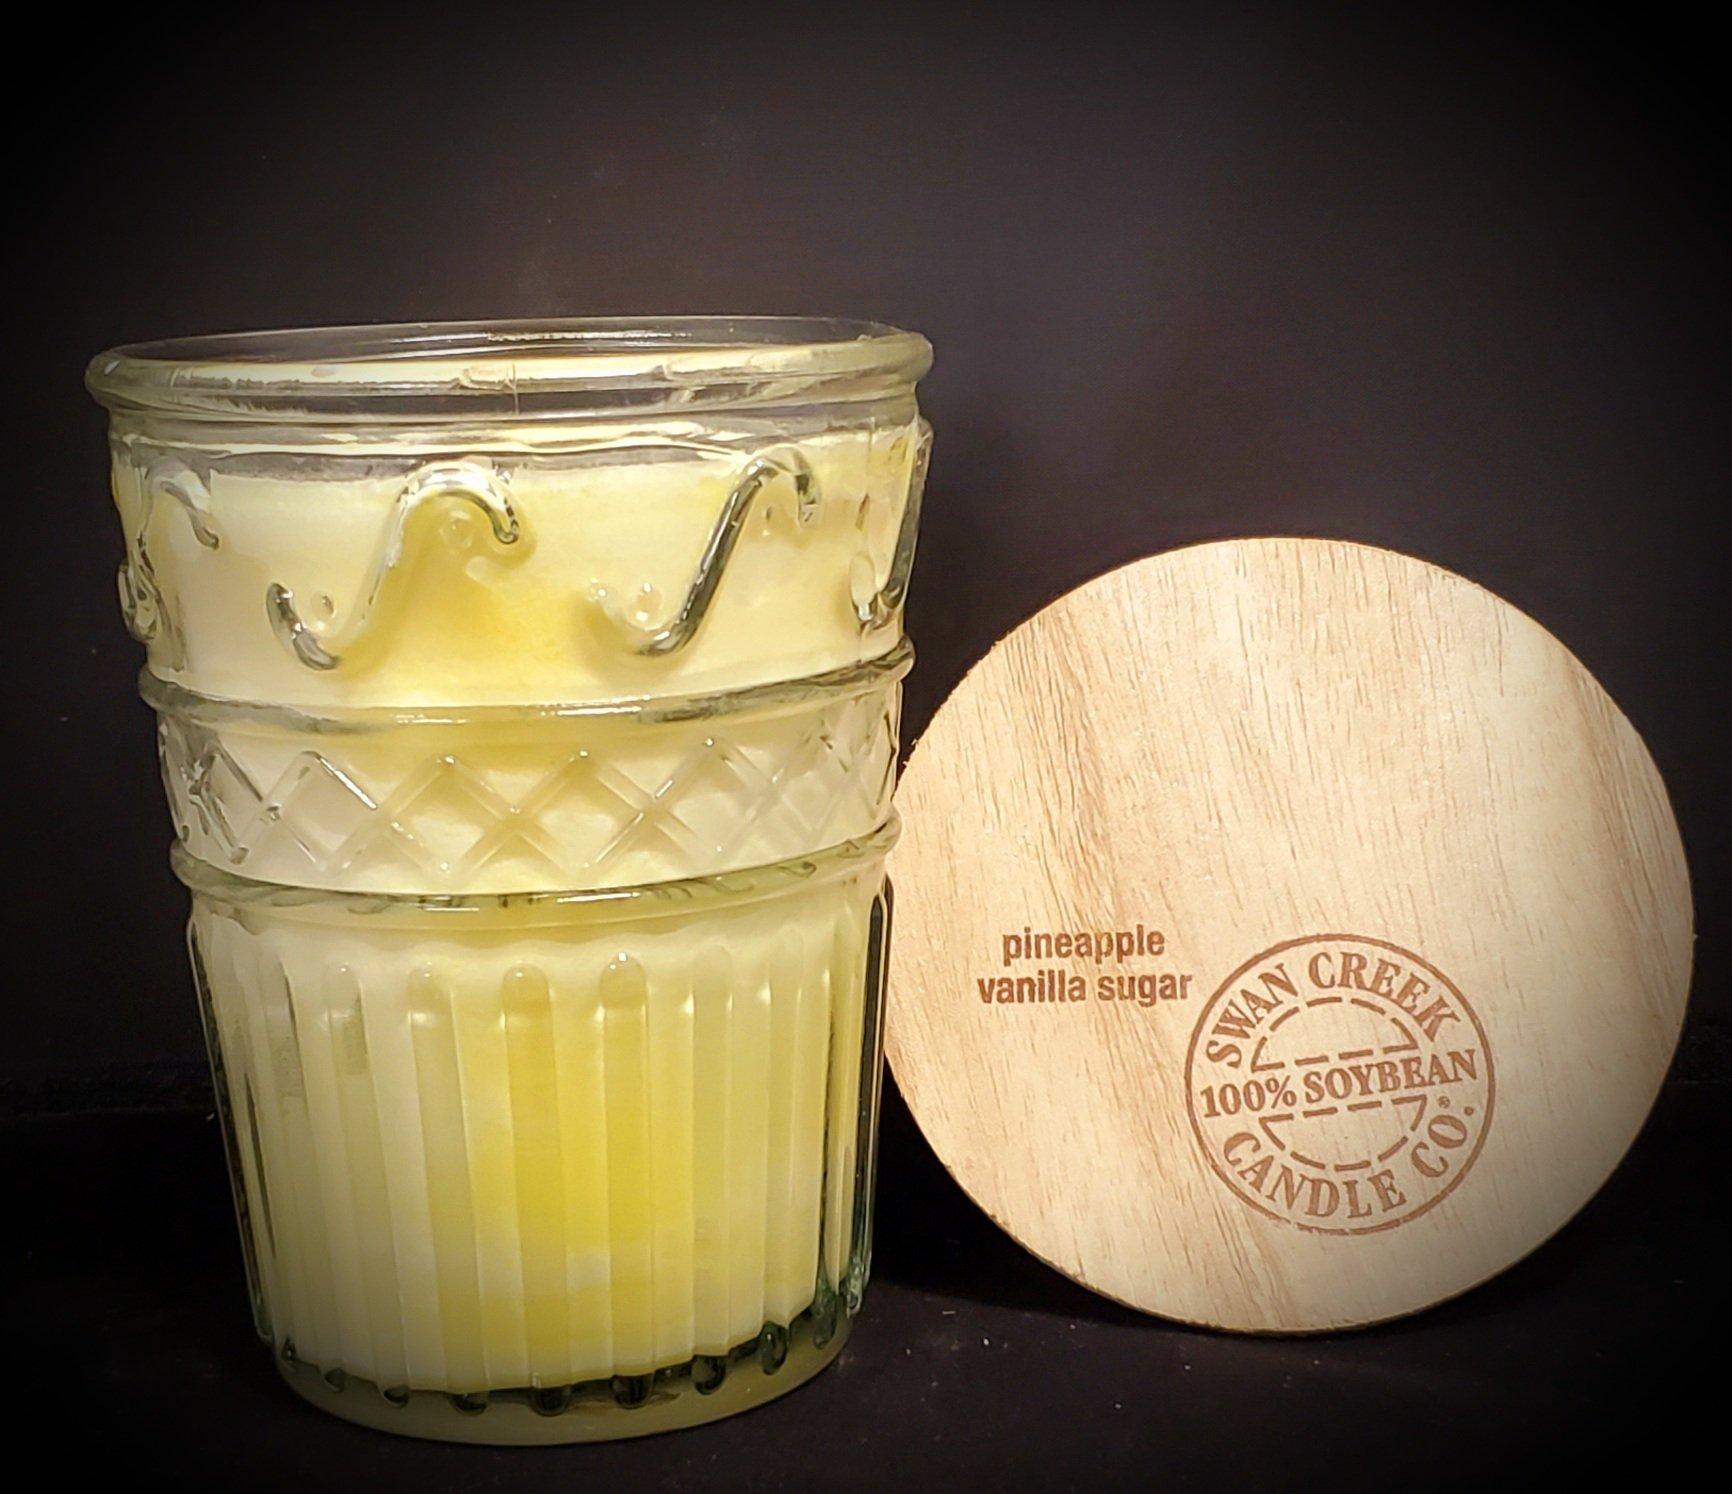 Swan Creek Candles Timeless Jar - Pineapple vanilla sugar